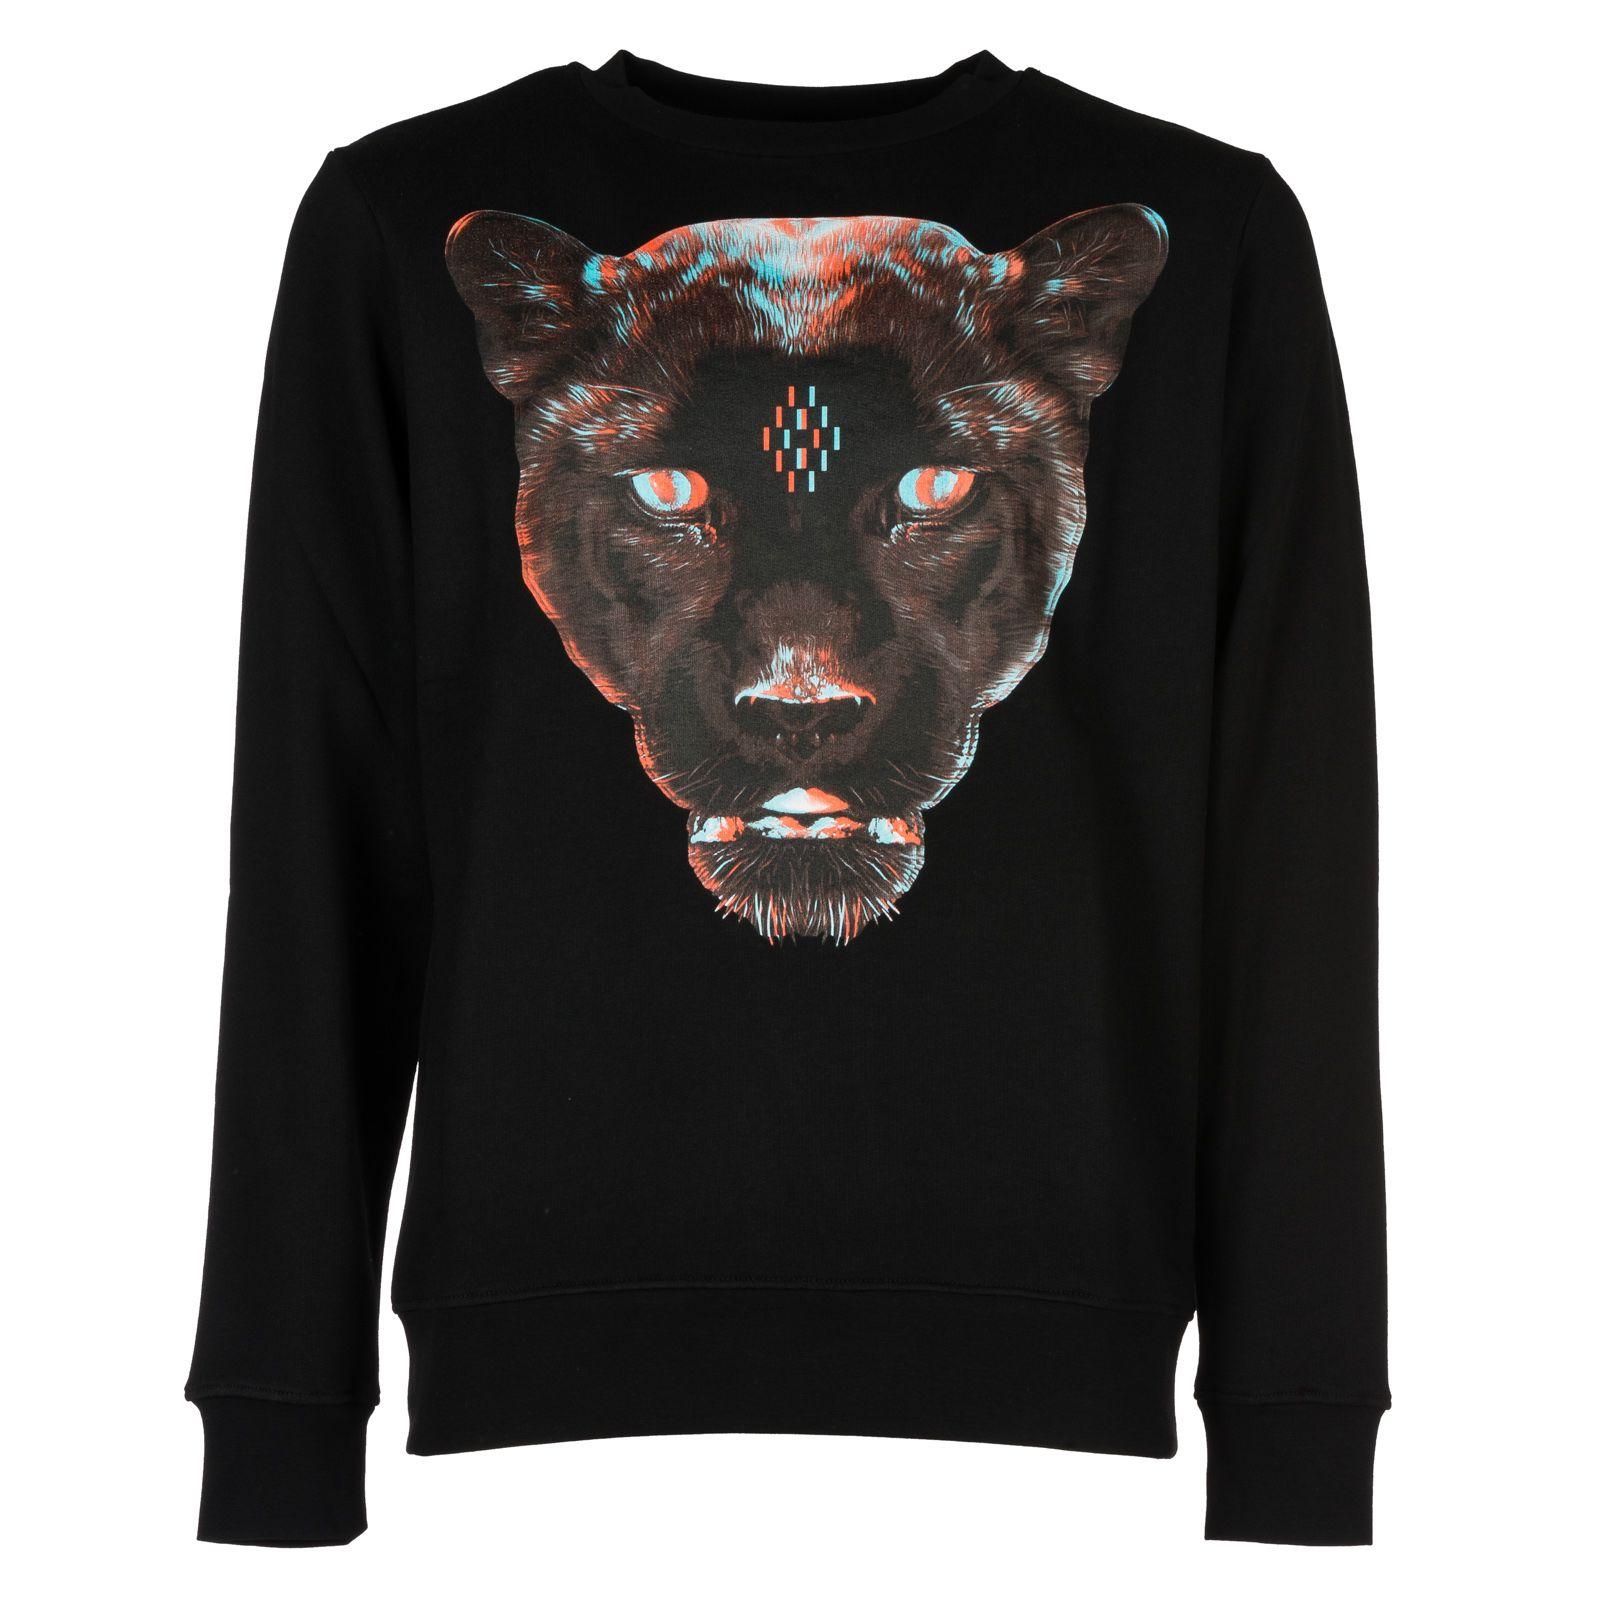 Marcelo Burlon County Of Milan rufo Sweatshirt